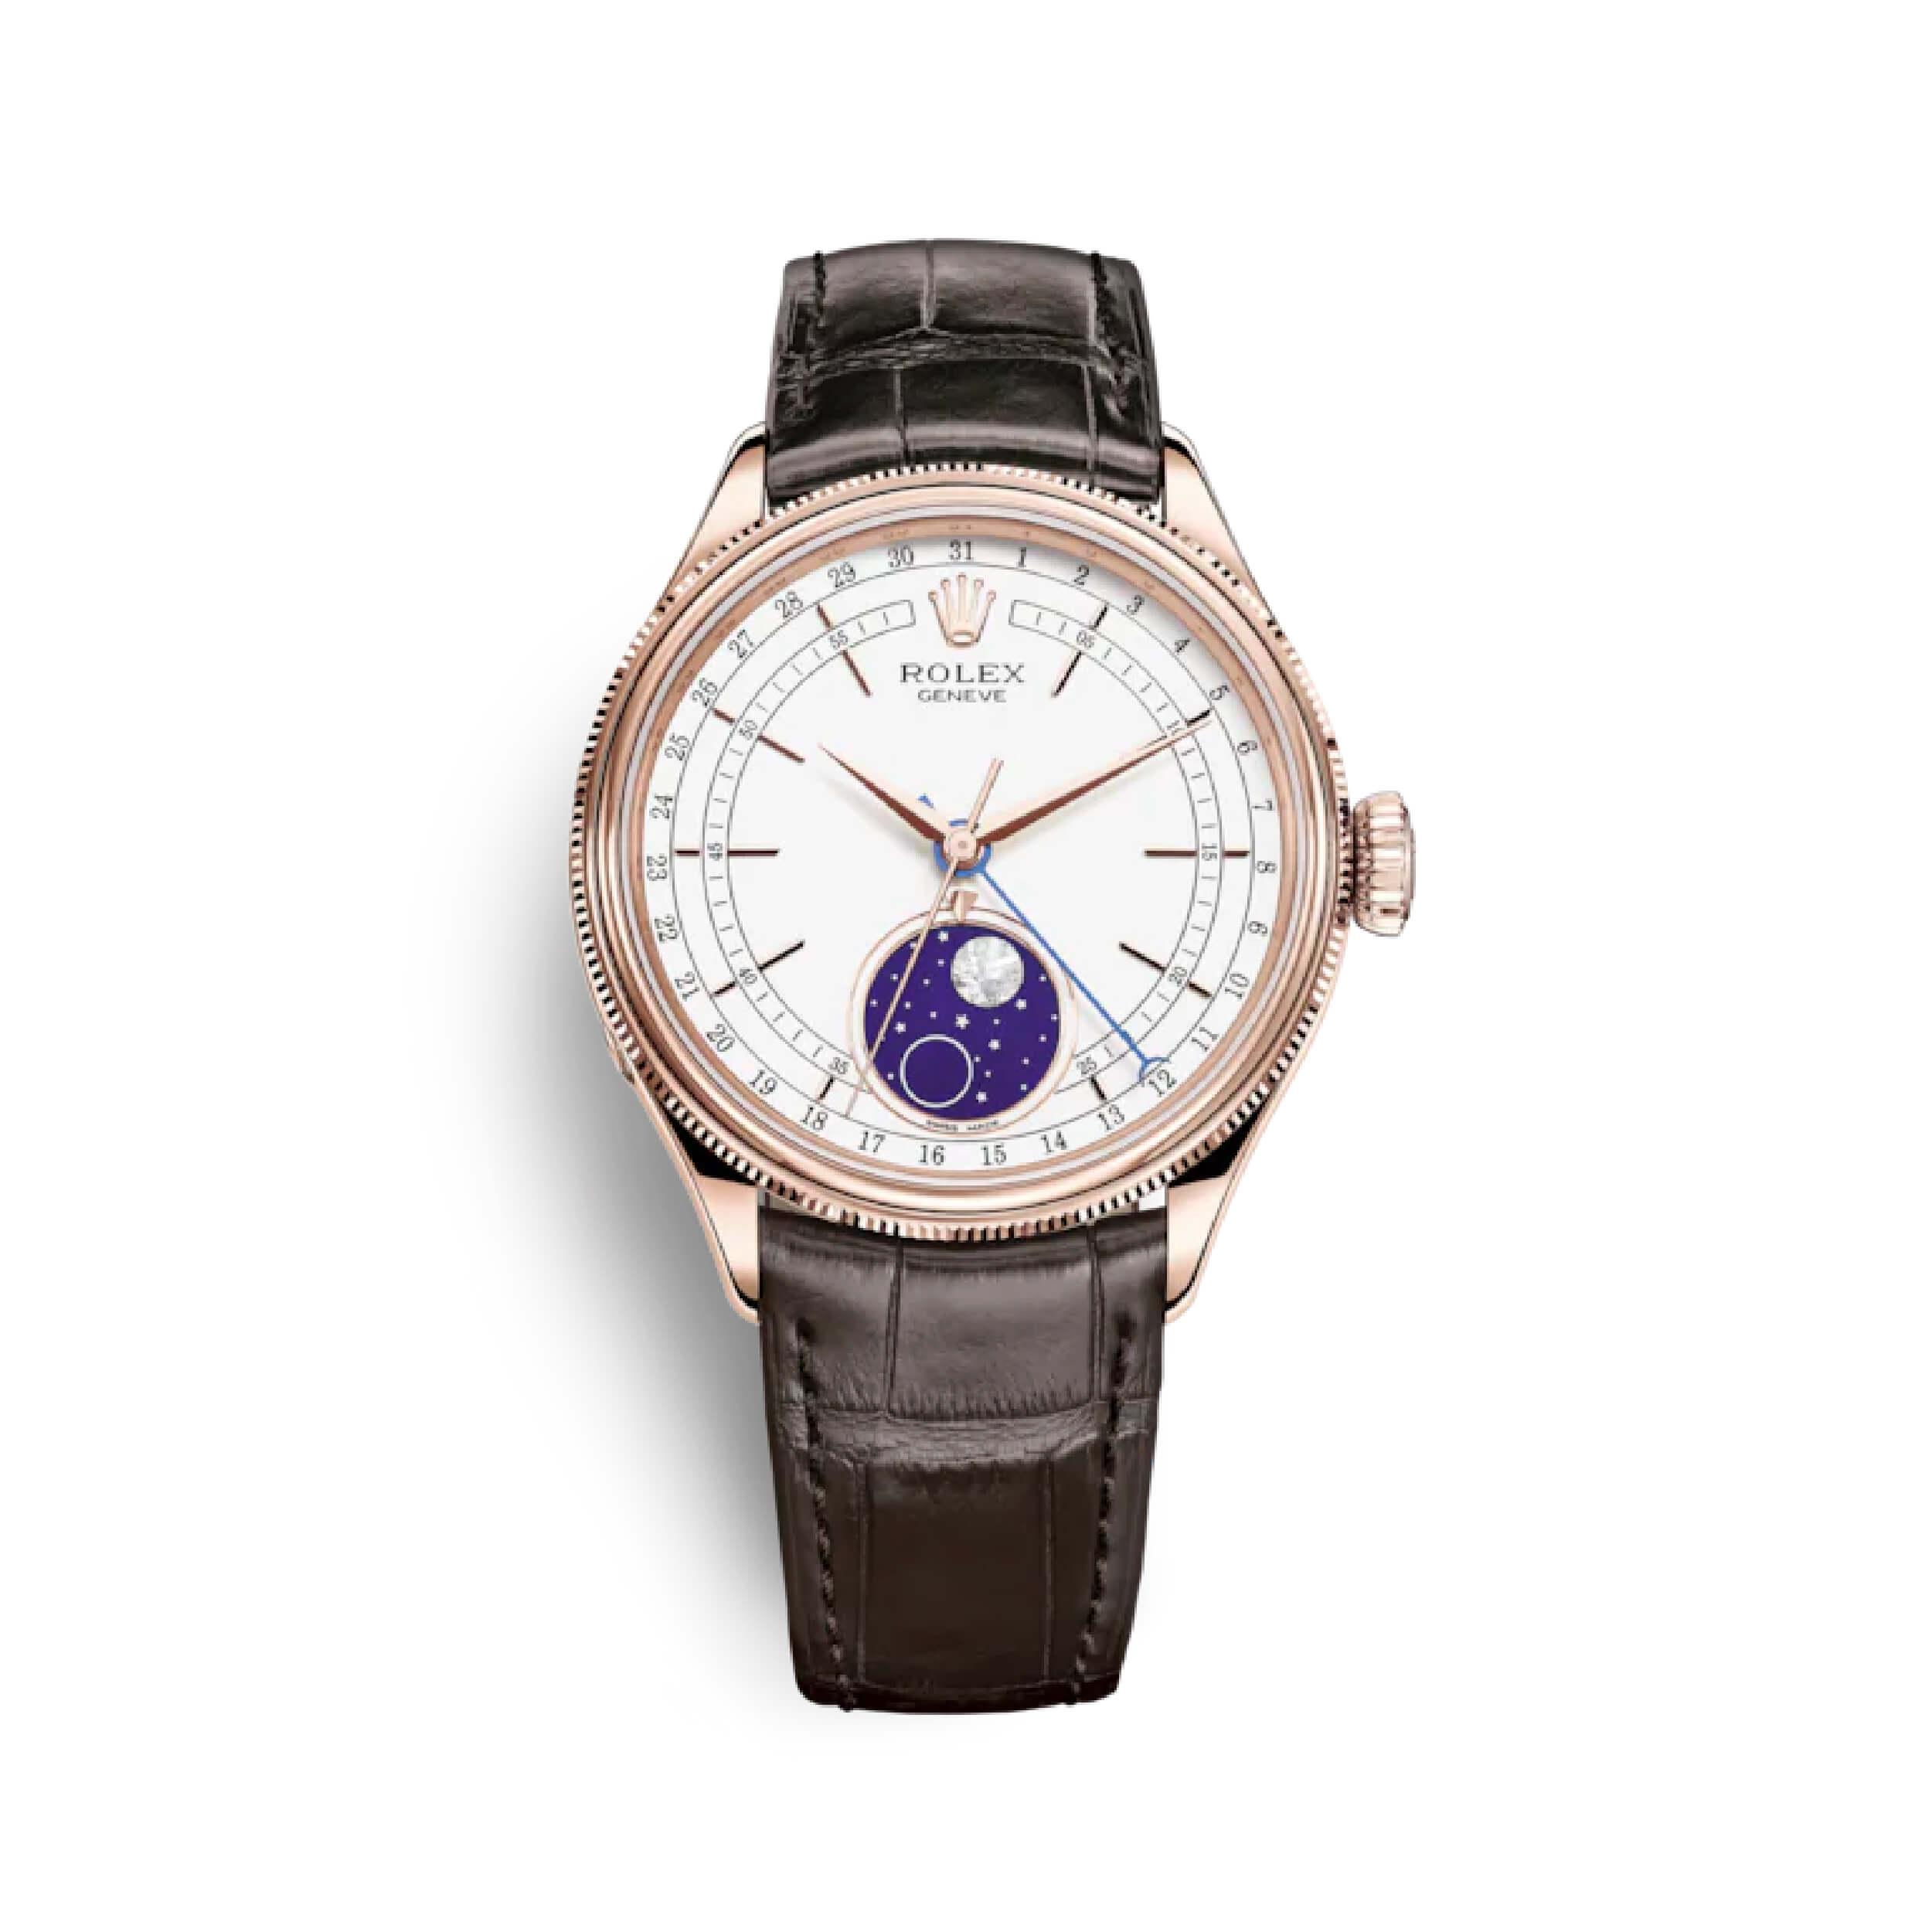 Rolex Cellini Moonphase | Wristwatches360